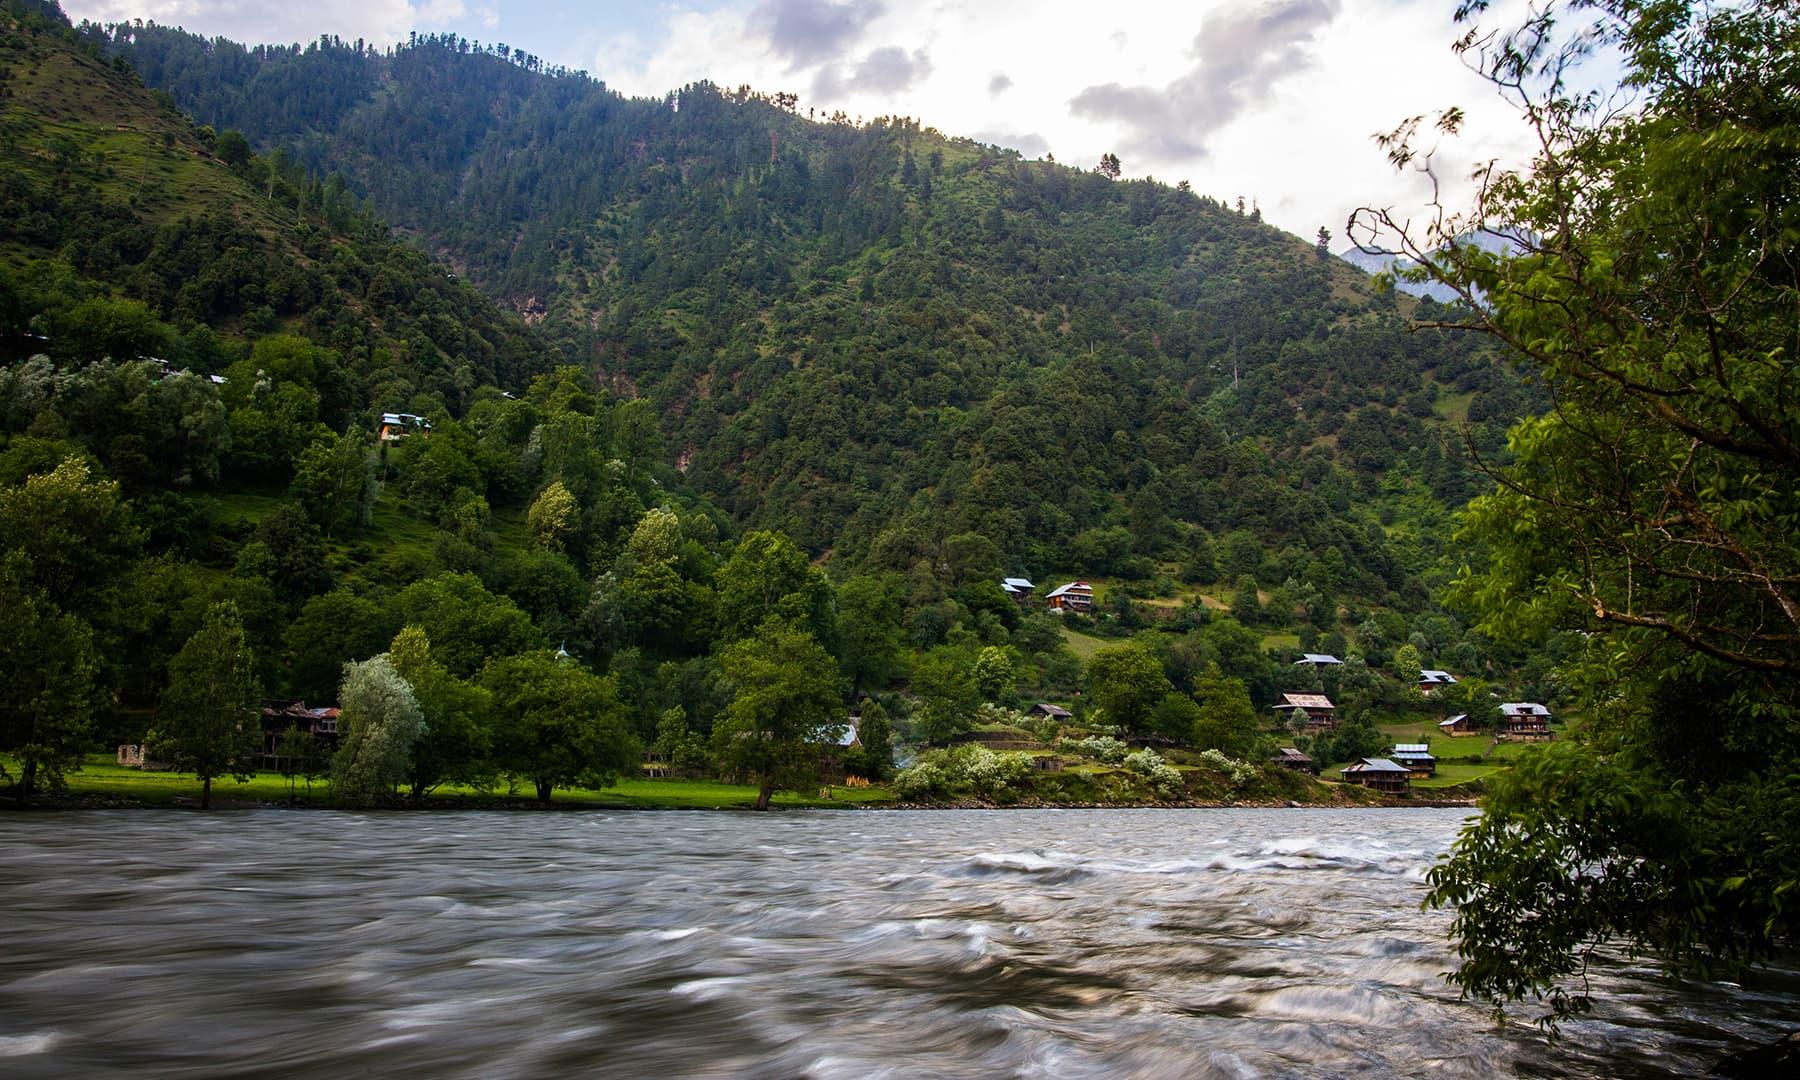 The Keran View Resort. —Marvi Soomro